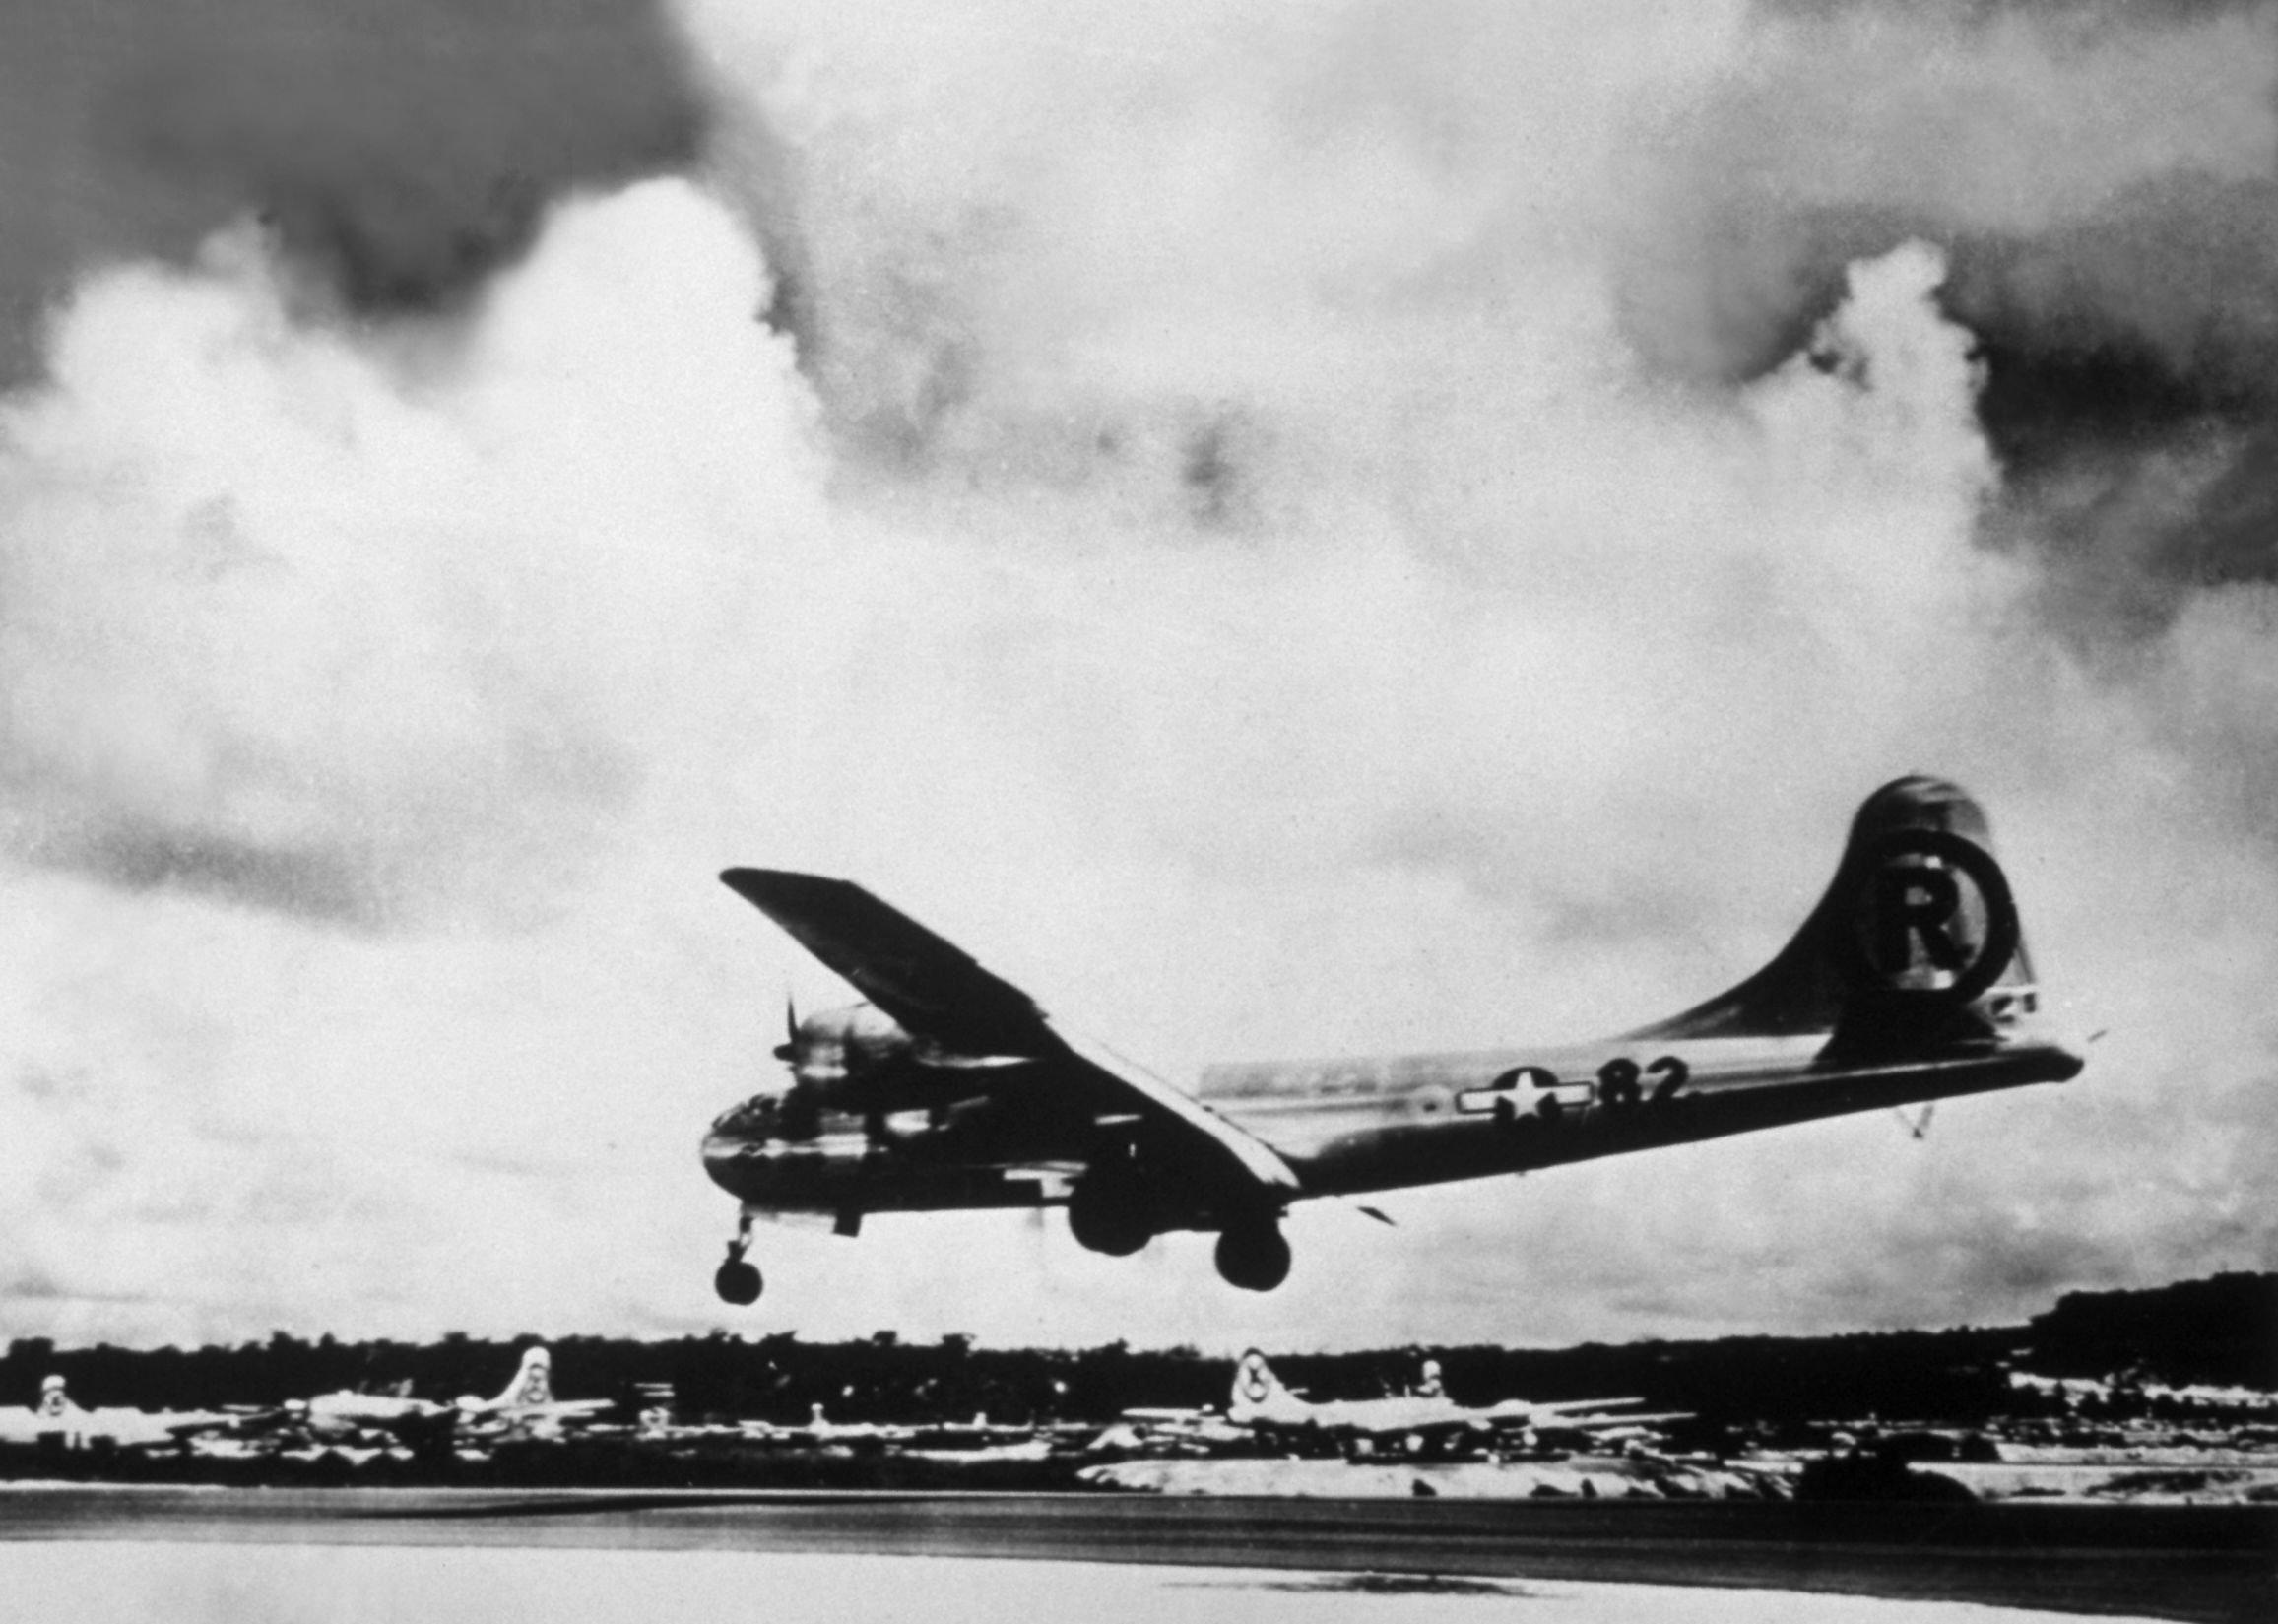 Enola Gay dopo aver sganciato la bomba atomica, 1945 (Getty)